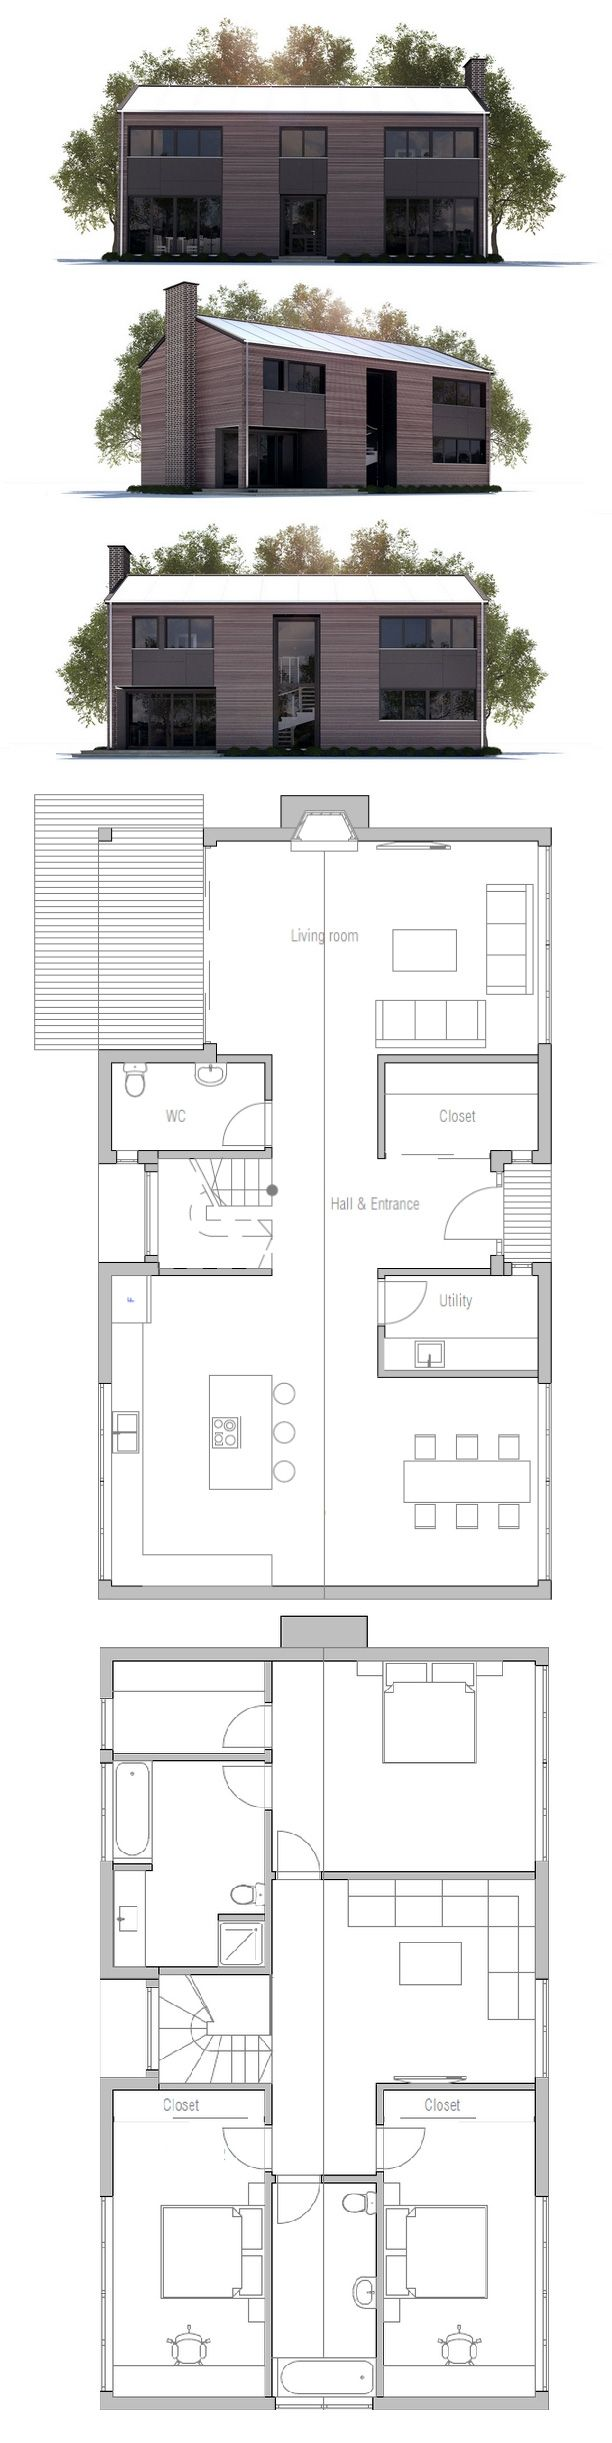 Small Modern House Floor Plan 434 best